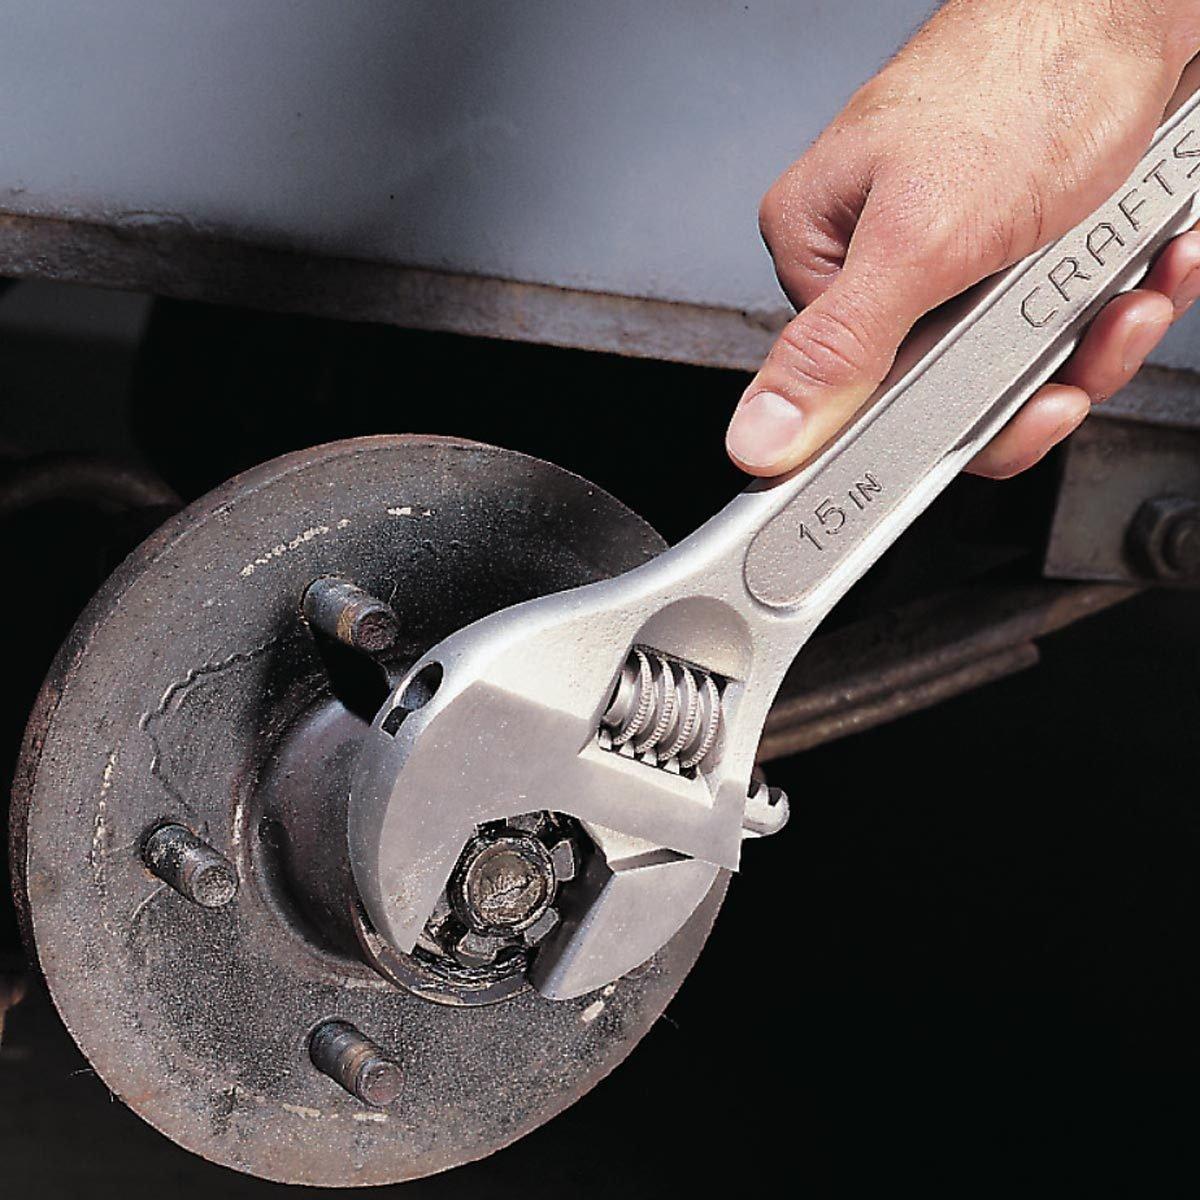 Repacking Trailer Wheel Bearings Family Handyman The Tracker Pontoon Boats Besides 4 Wire Wiring Harness Diagram Reassemble Hub